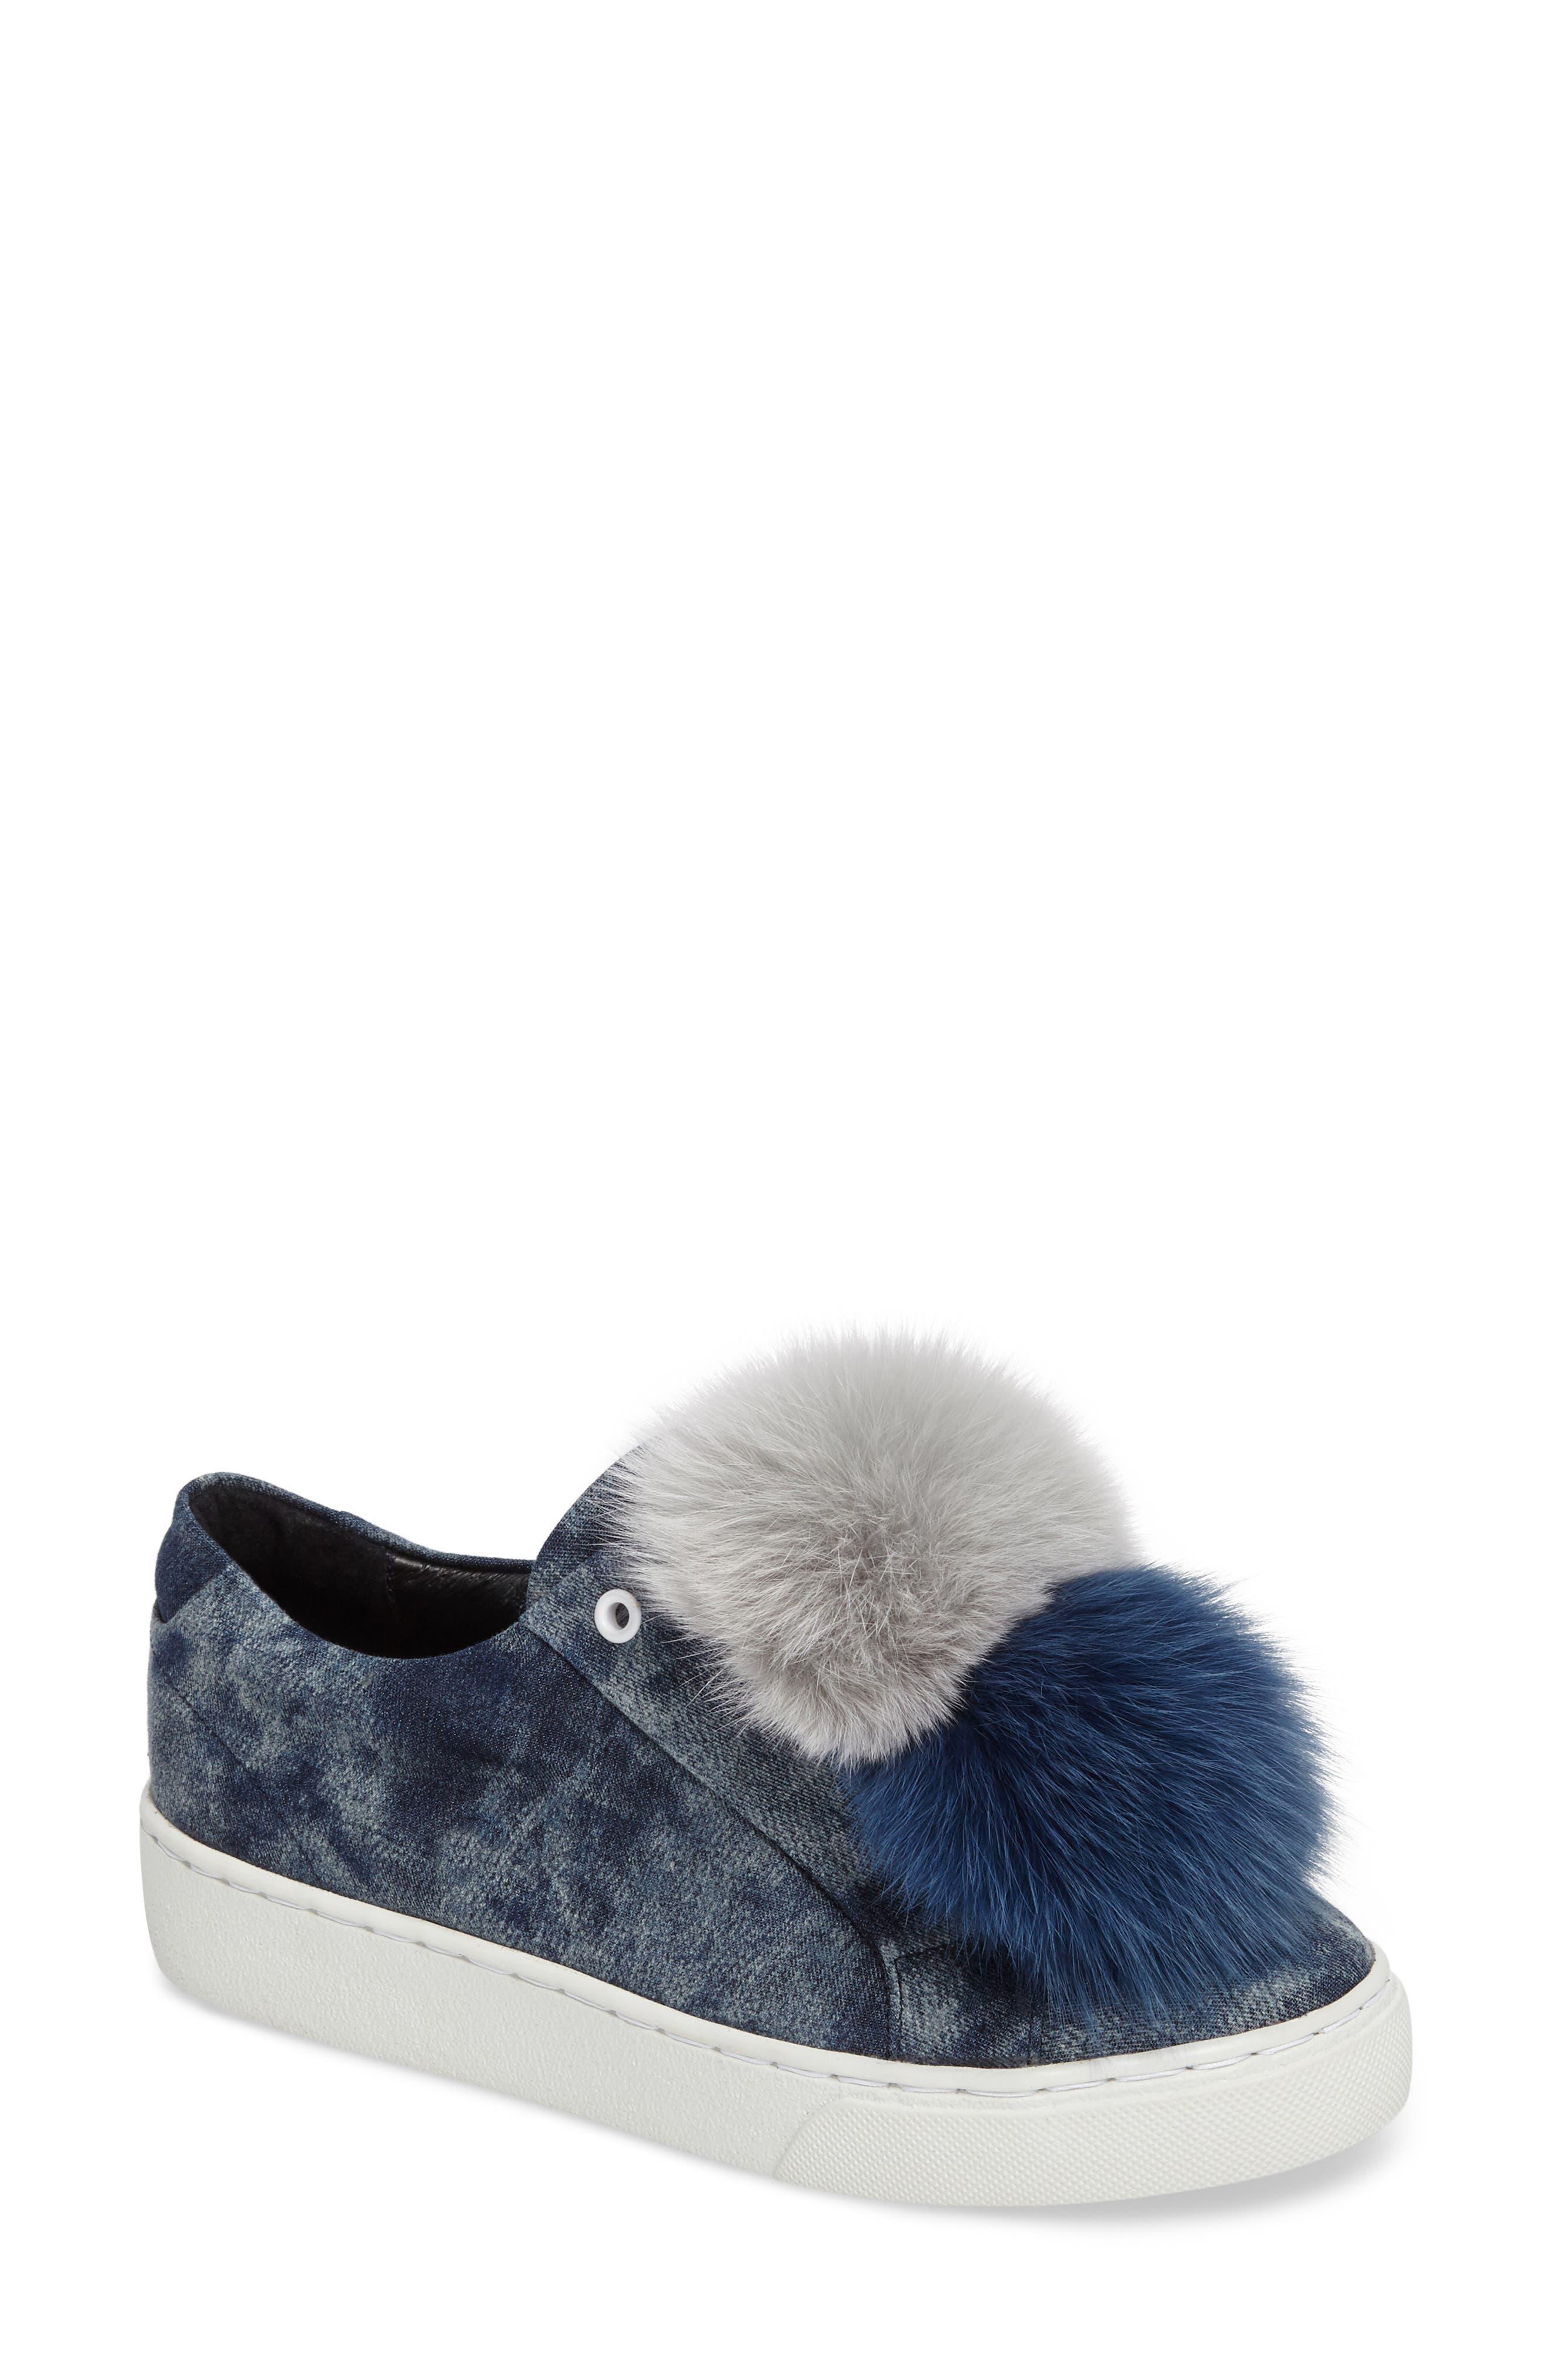 Joey Genuine Fox Fur Trim Sneaker,                         Main,                         color, Blue Tiedye Denim